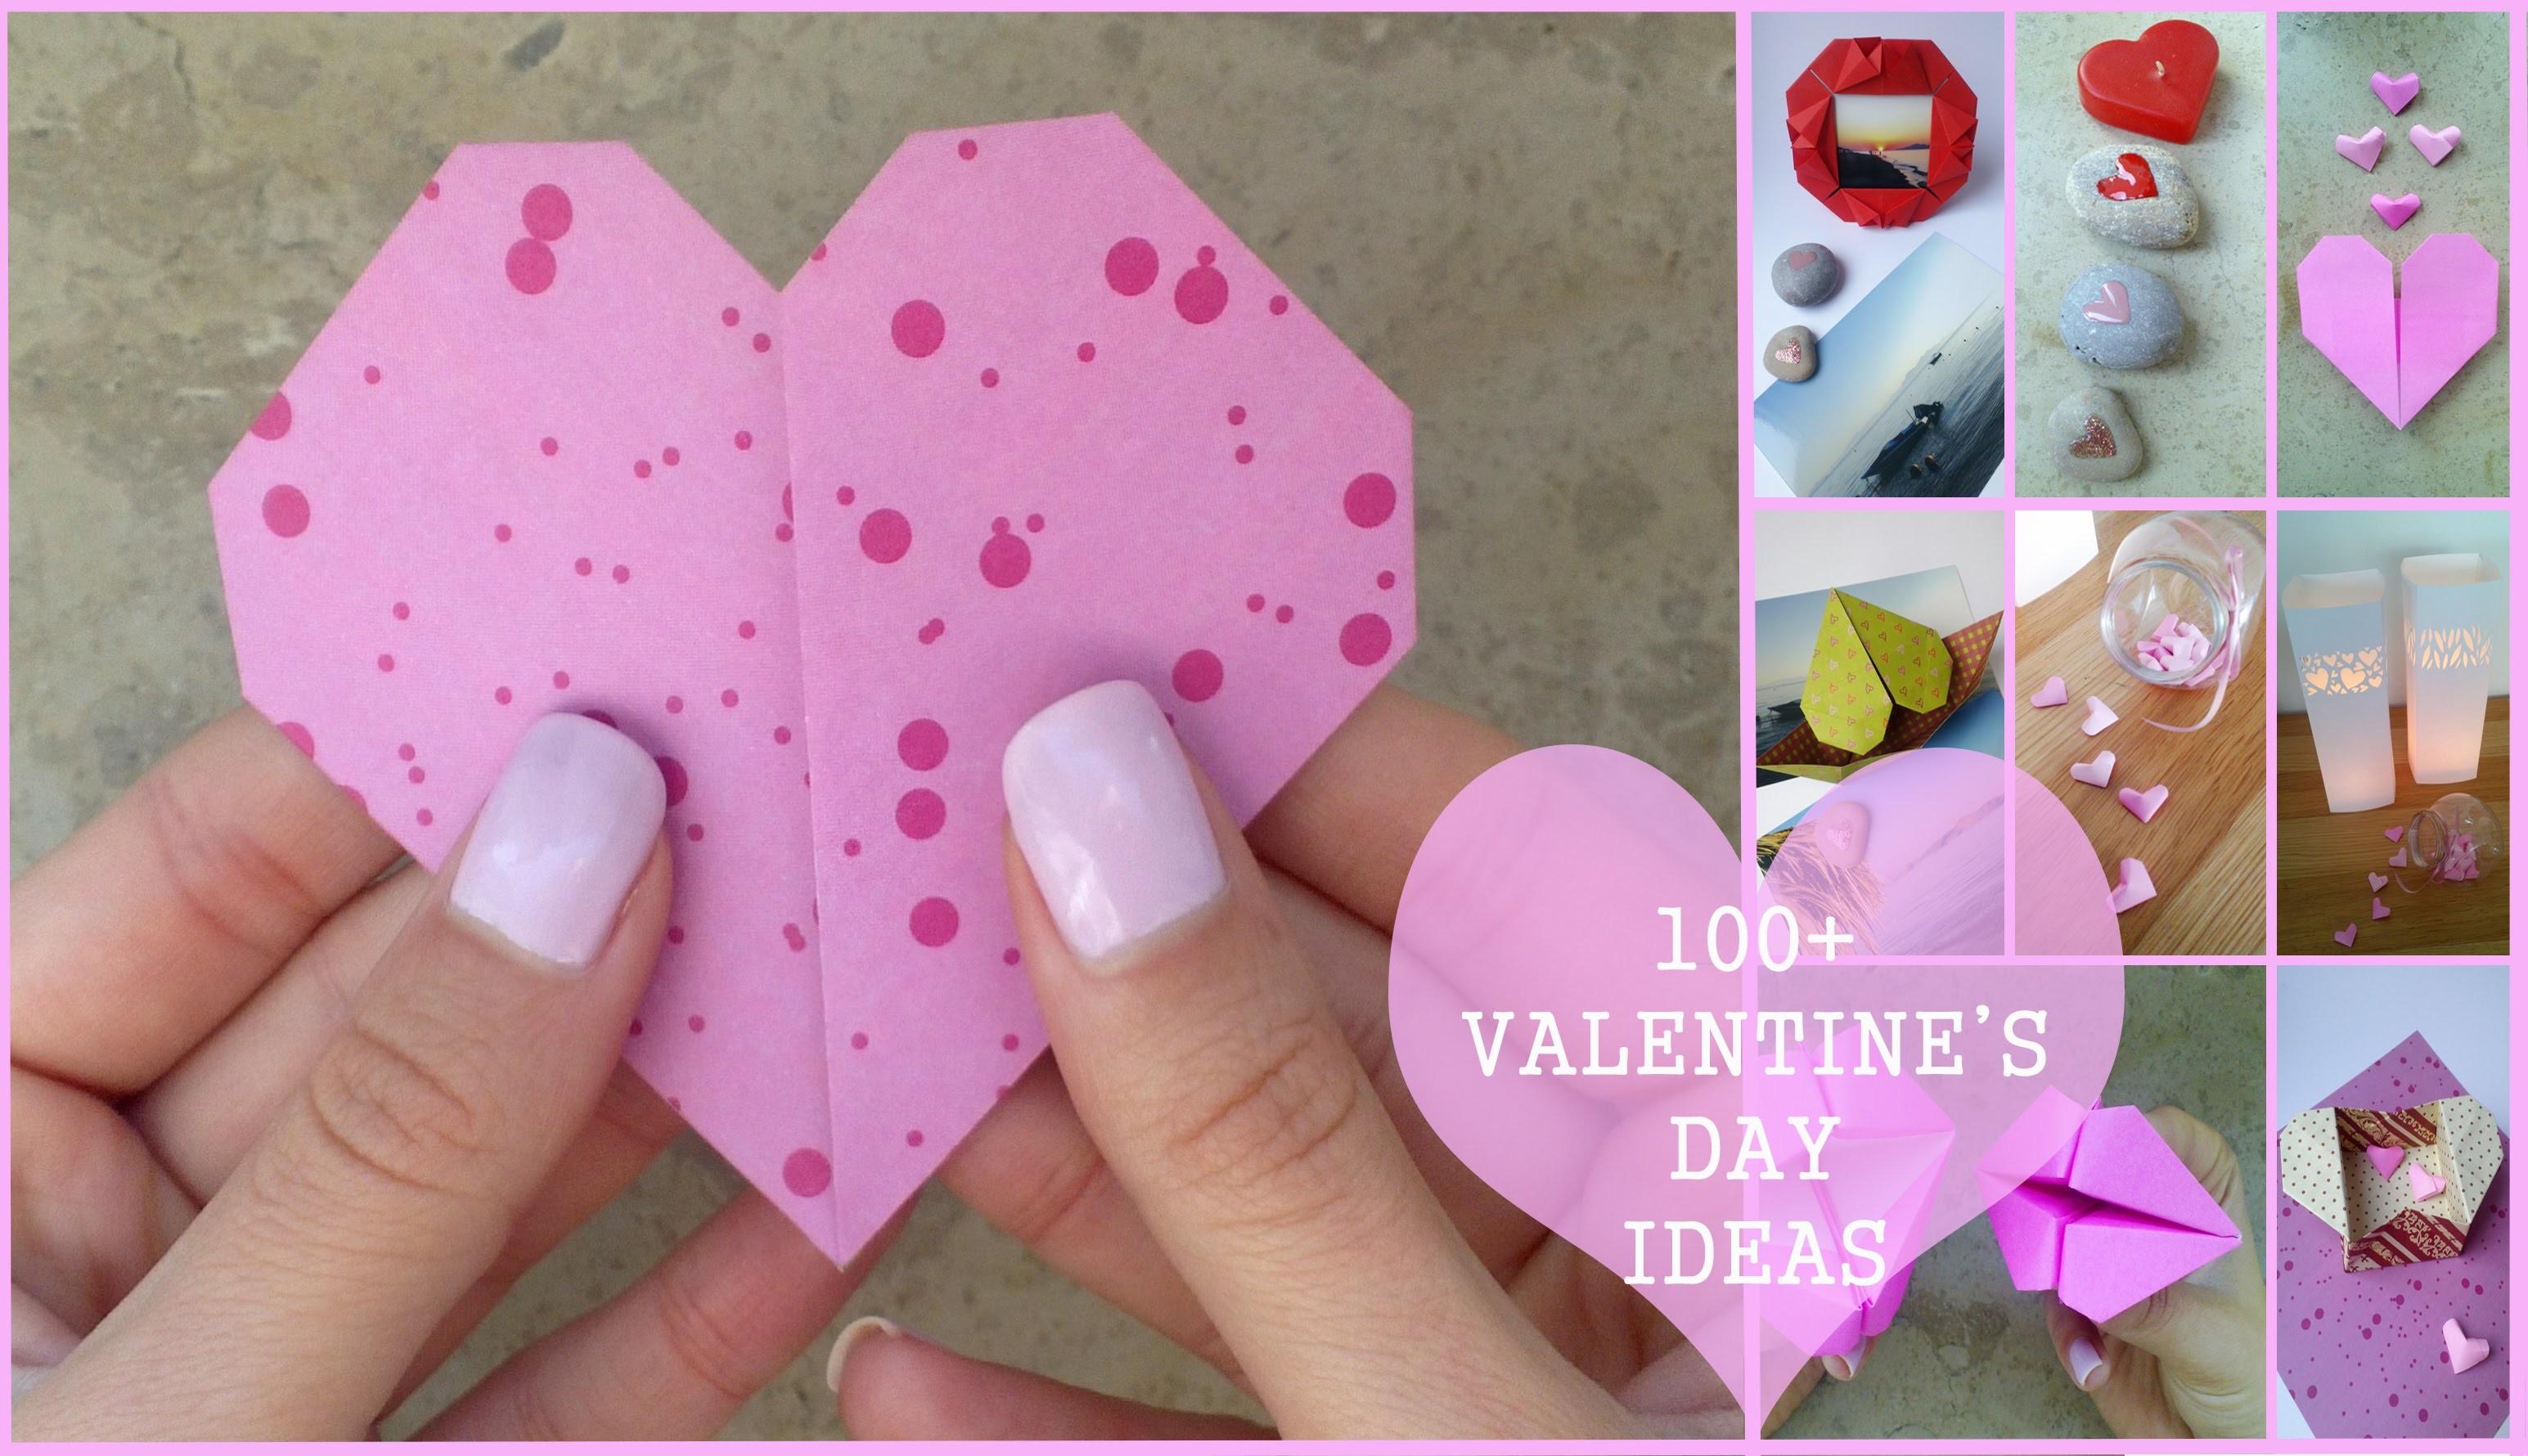 DIY 100+ VALENTINE'S DAY IDEAS - #10 Origami heart (3 steps).